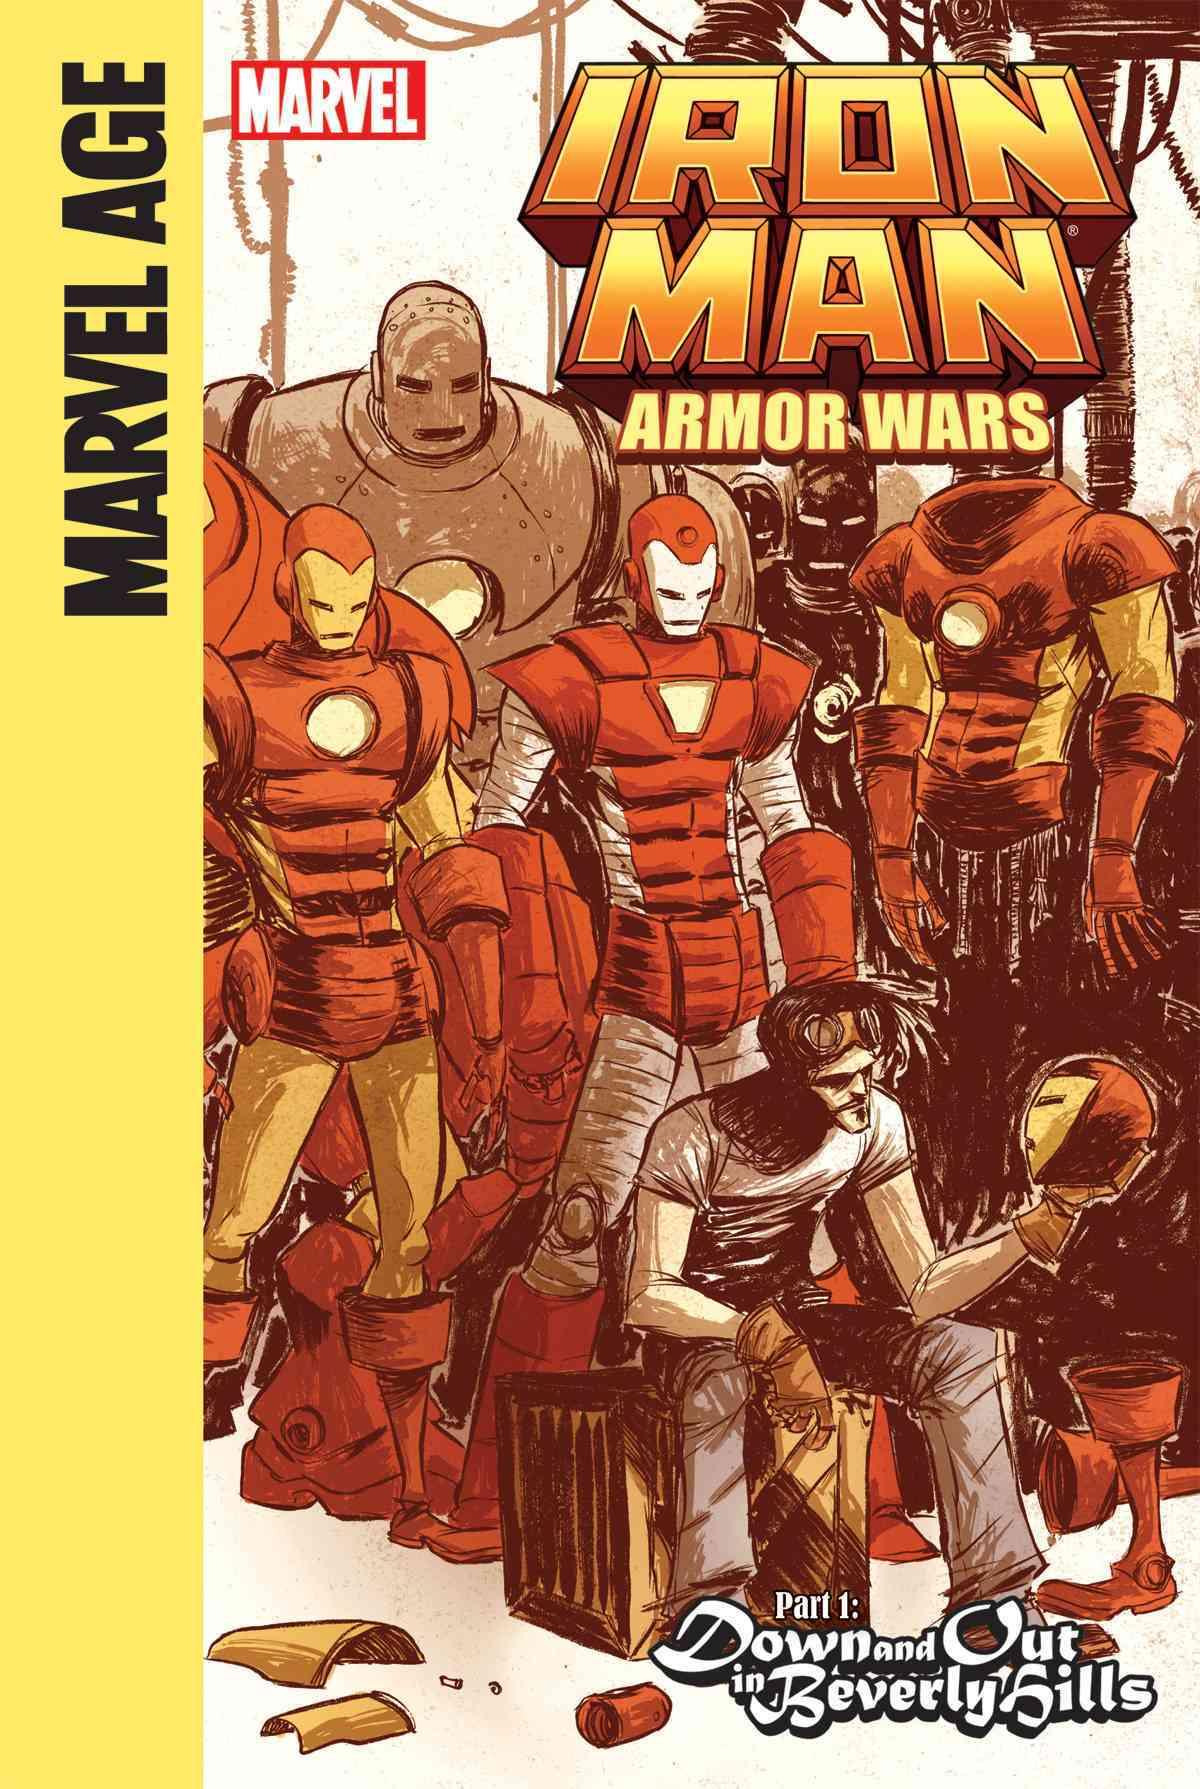 Iron Man and the Armor Wars 1 By Caramagna, Joe